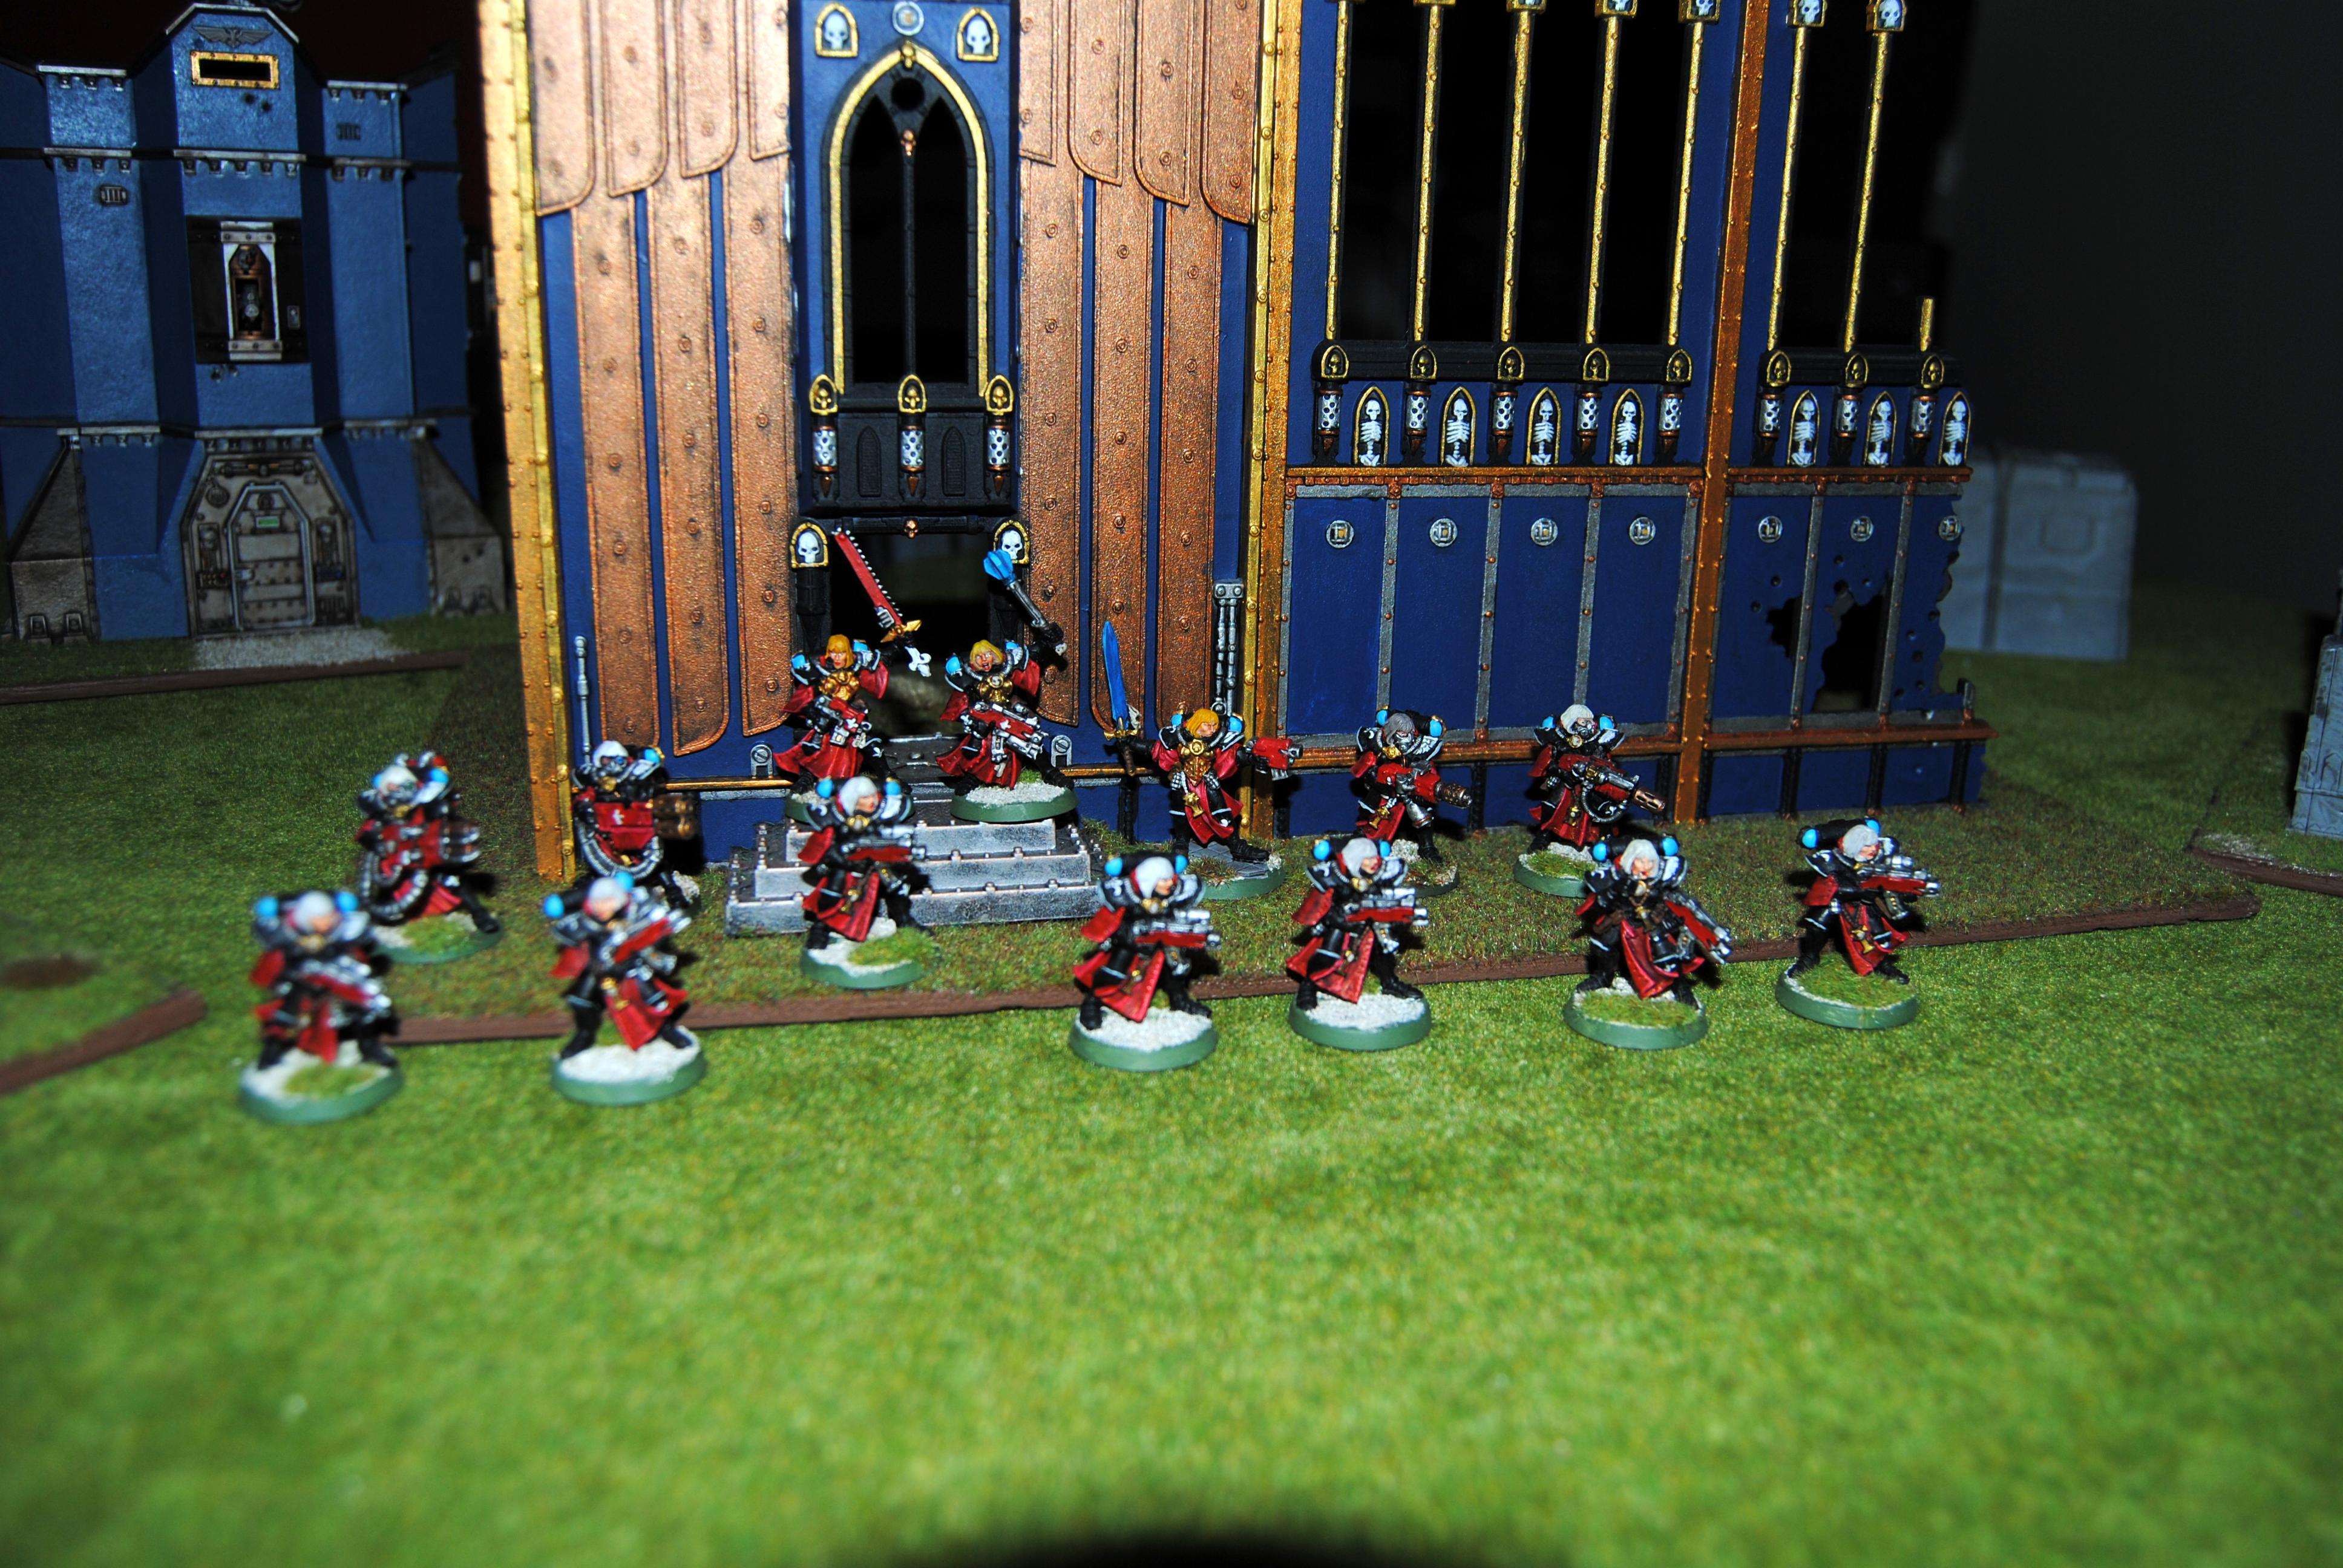 Adepta Sororitas, Battle Sisters Squad, Flamer, Heavy Flamer, Meltagun, Multi-melta, Sisters Of Battle, Veteran Sister Superior